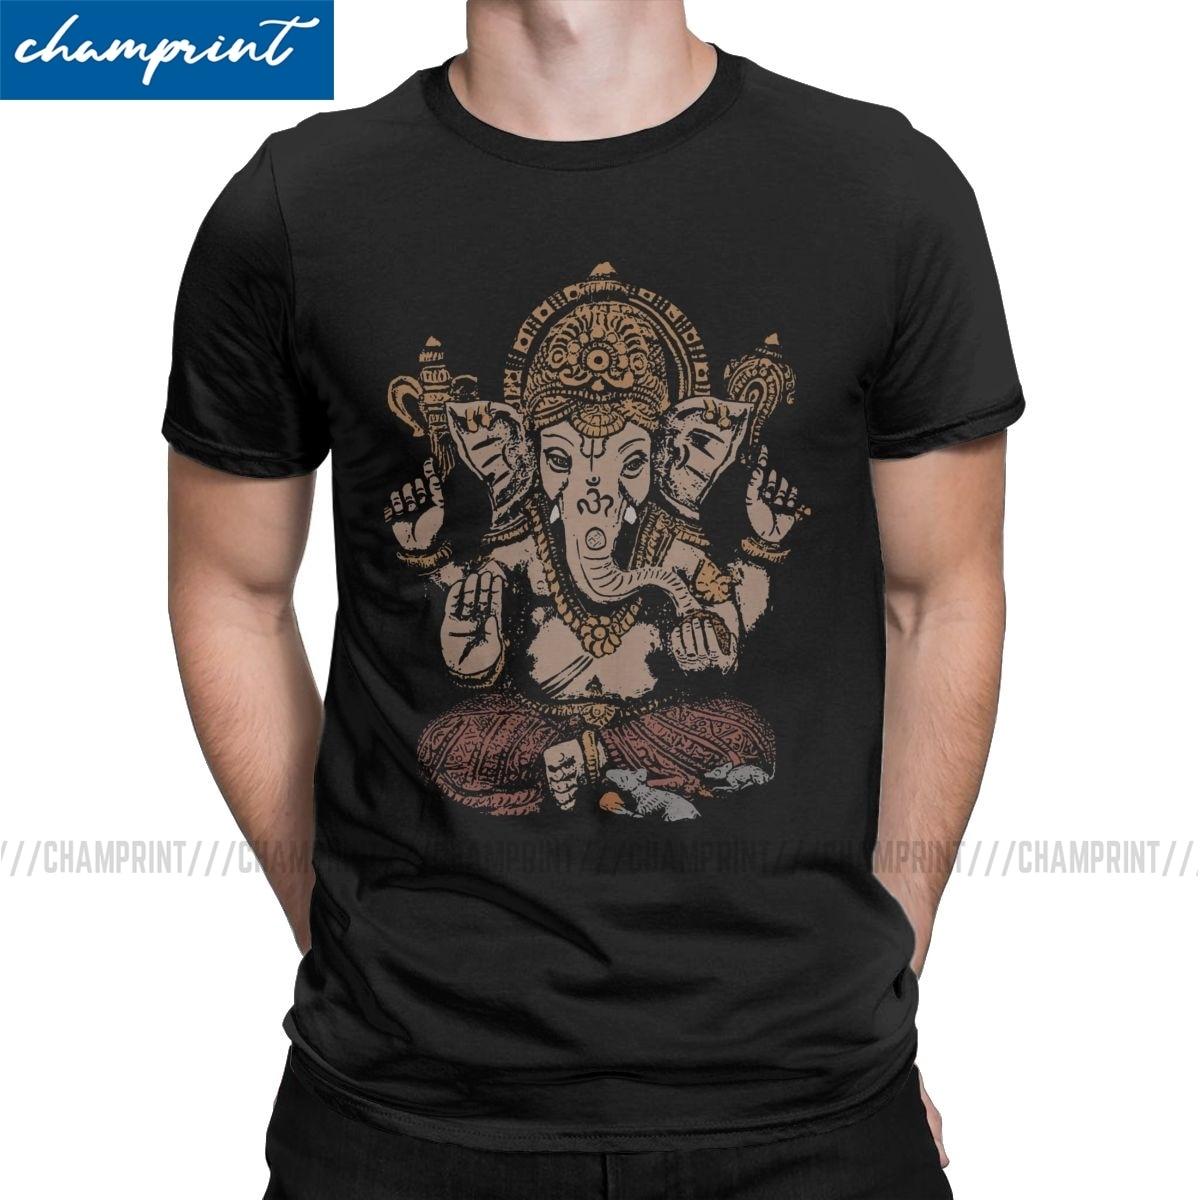 Ganesha, camiseta 3D para hombre, camisetas de algodón impresionantes, Collar redondo Shiva, dios hindú, India, Lingam, camisetas de manga corta, ropa de verano